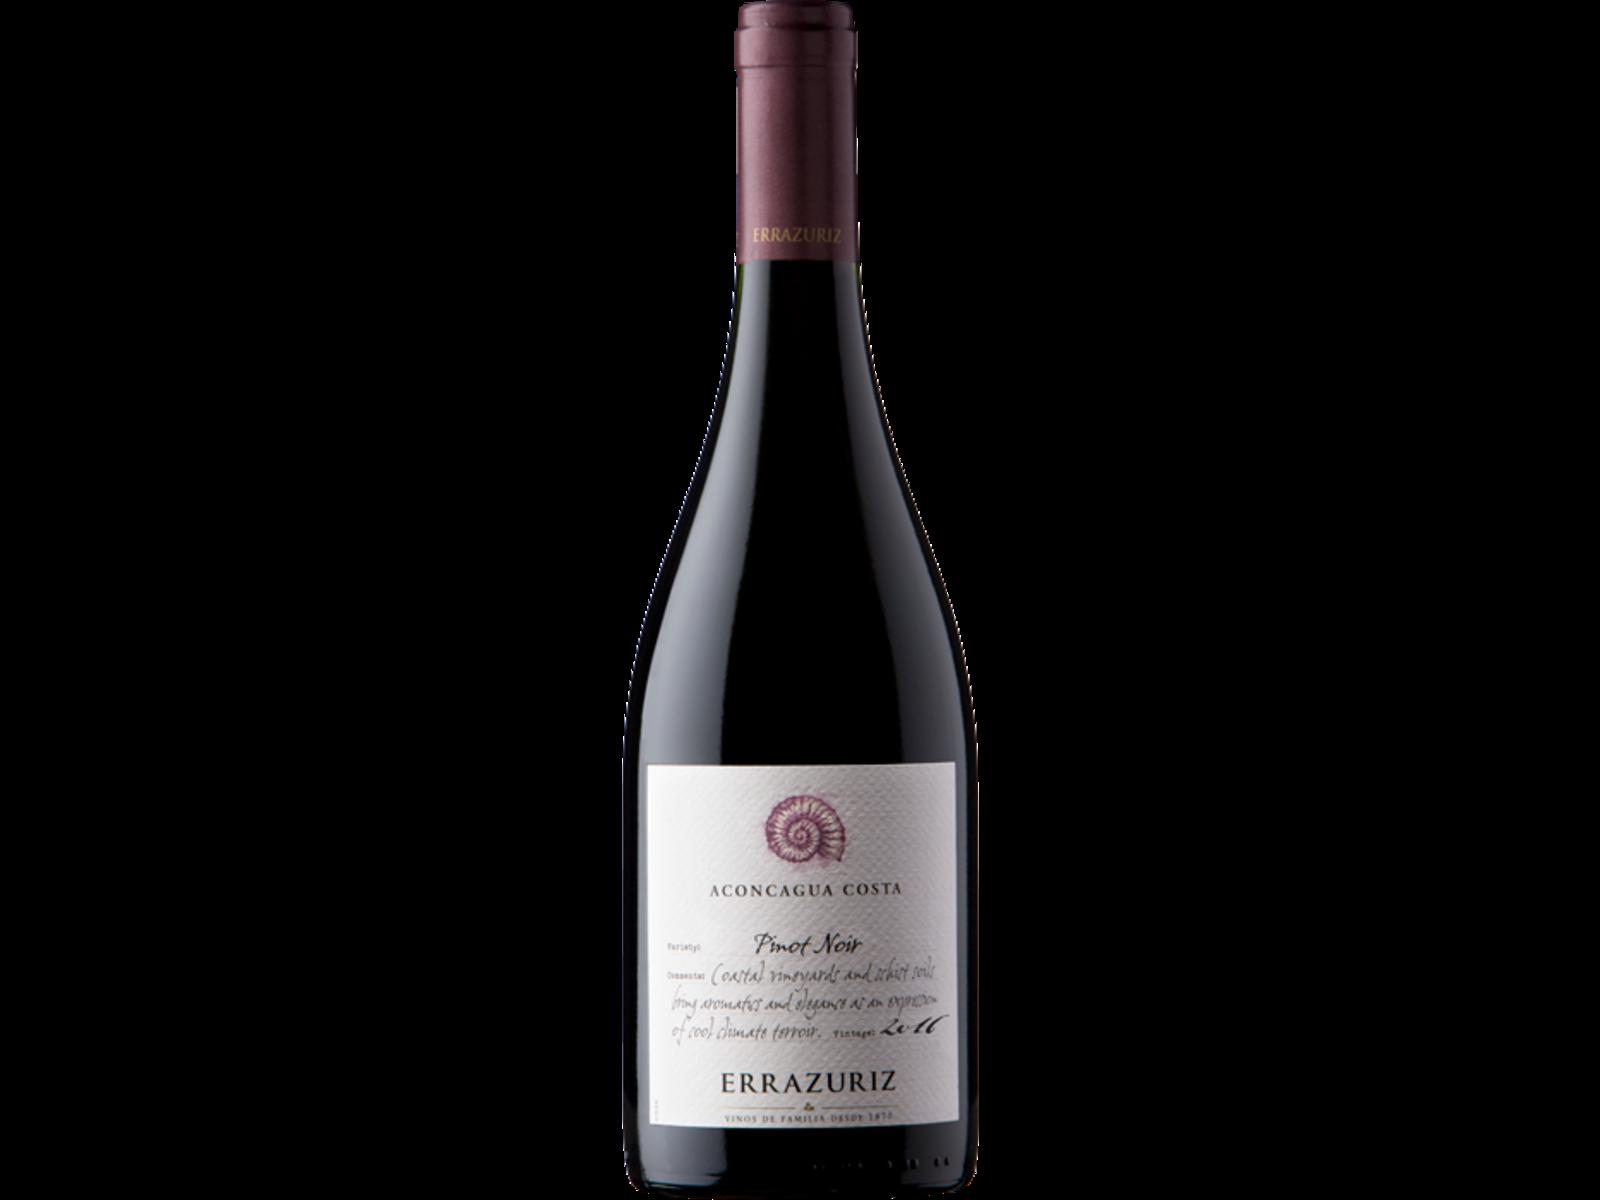 Viña Errázuriz Errazuriz / Aconcagua Costa / Pinot Noir